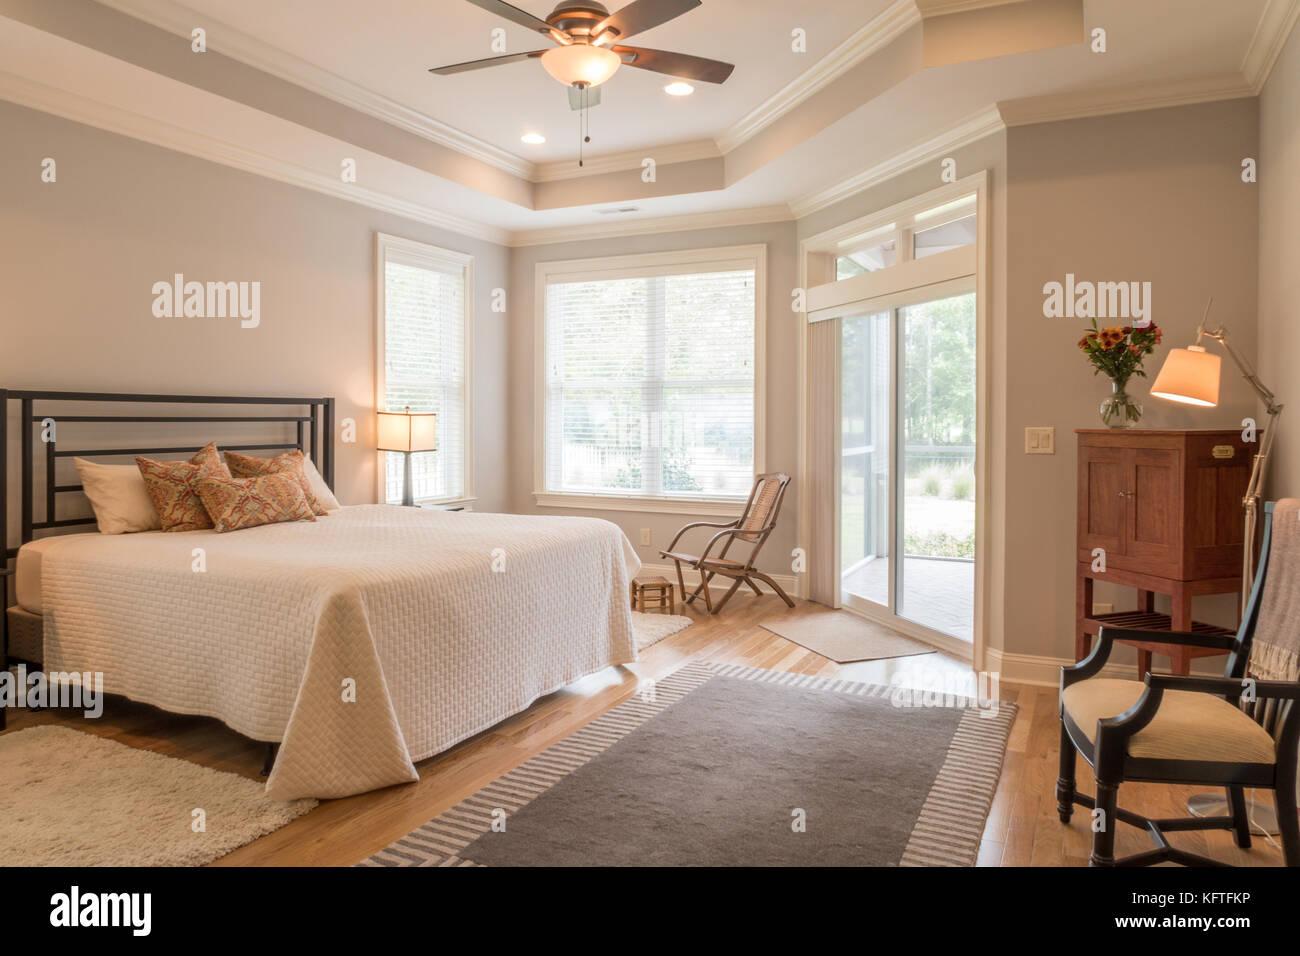 Gehobenen Wohn- Schlafzimmer, USA Stockfoto, Bild: 164652314 - Alamy